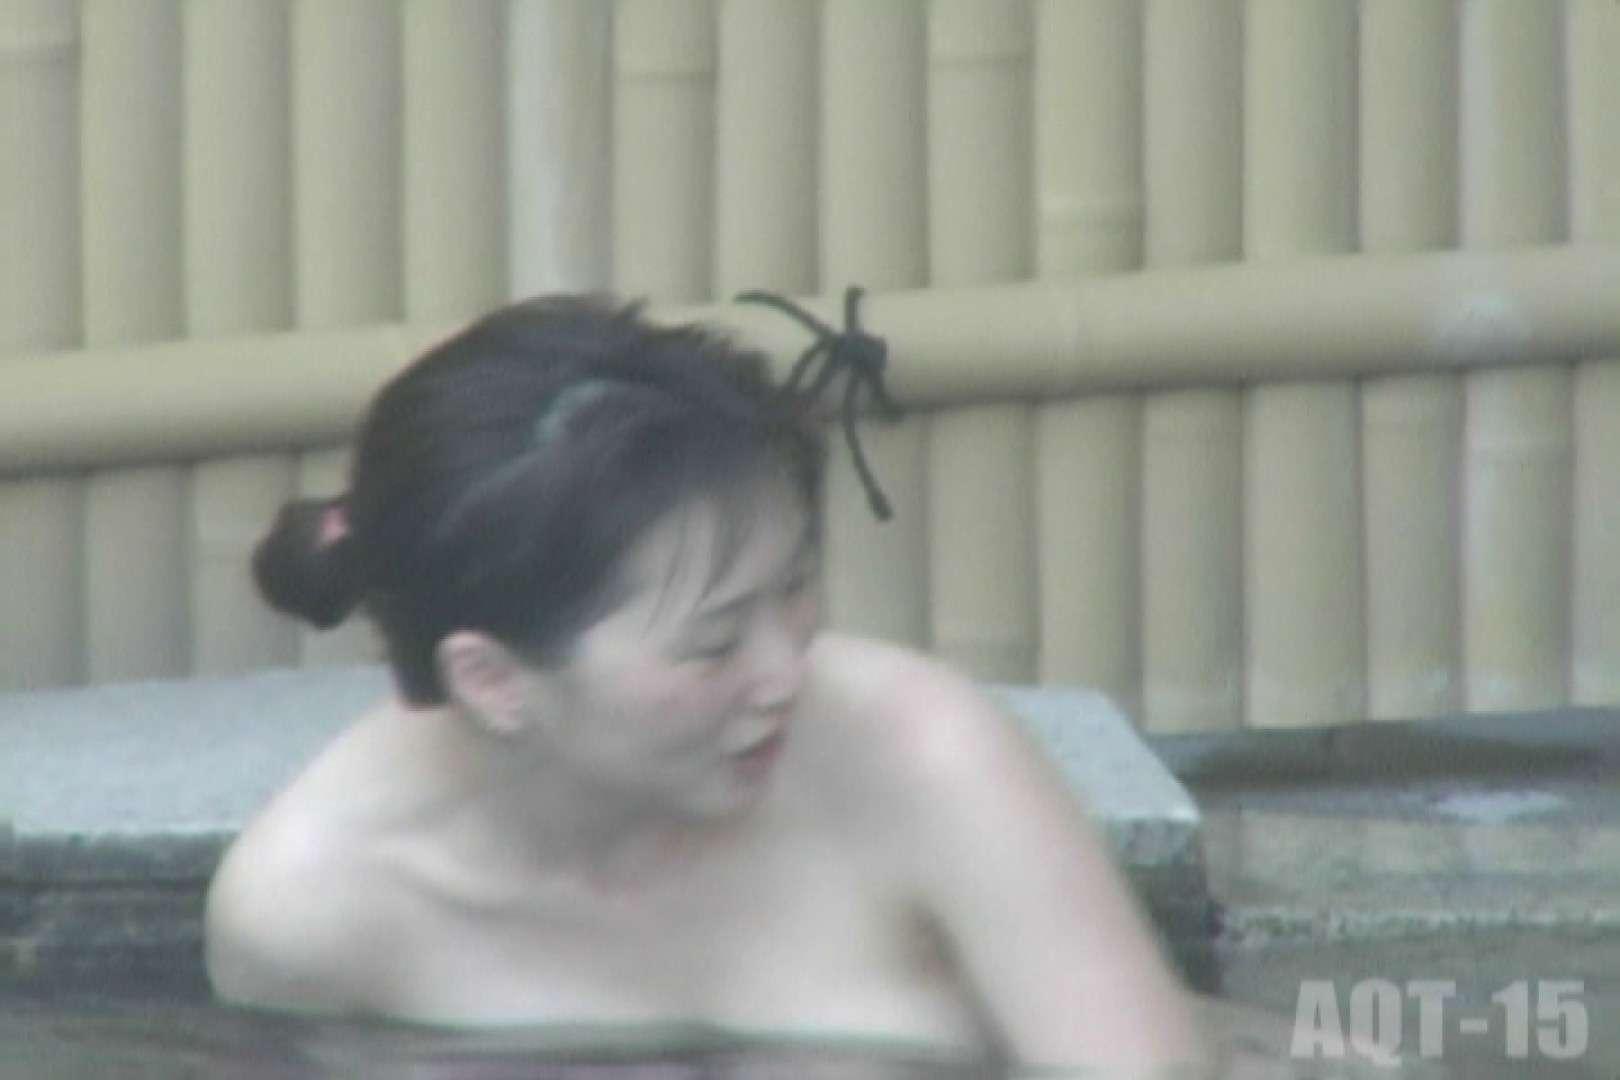 Aquaな露天風呂Vol.831 露天   HなOL  99pic 13